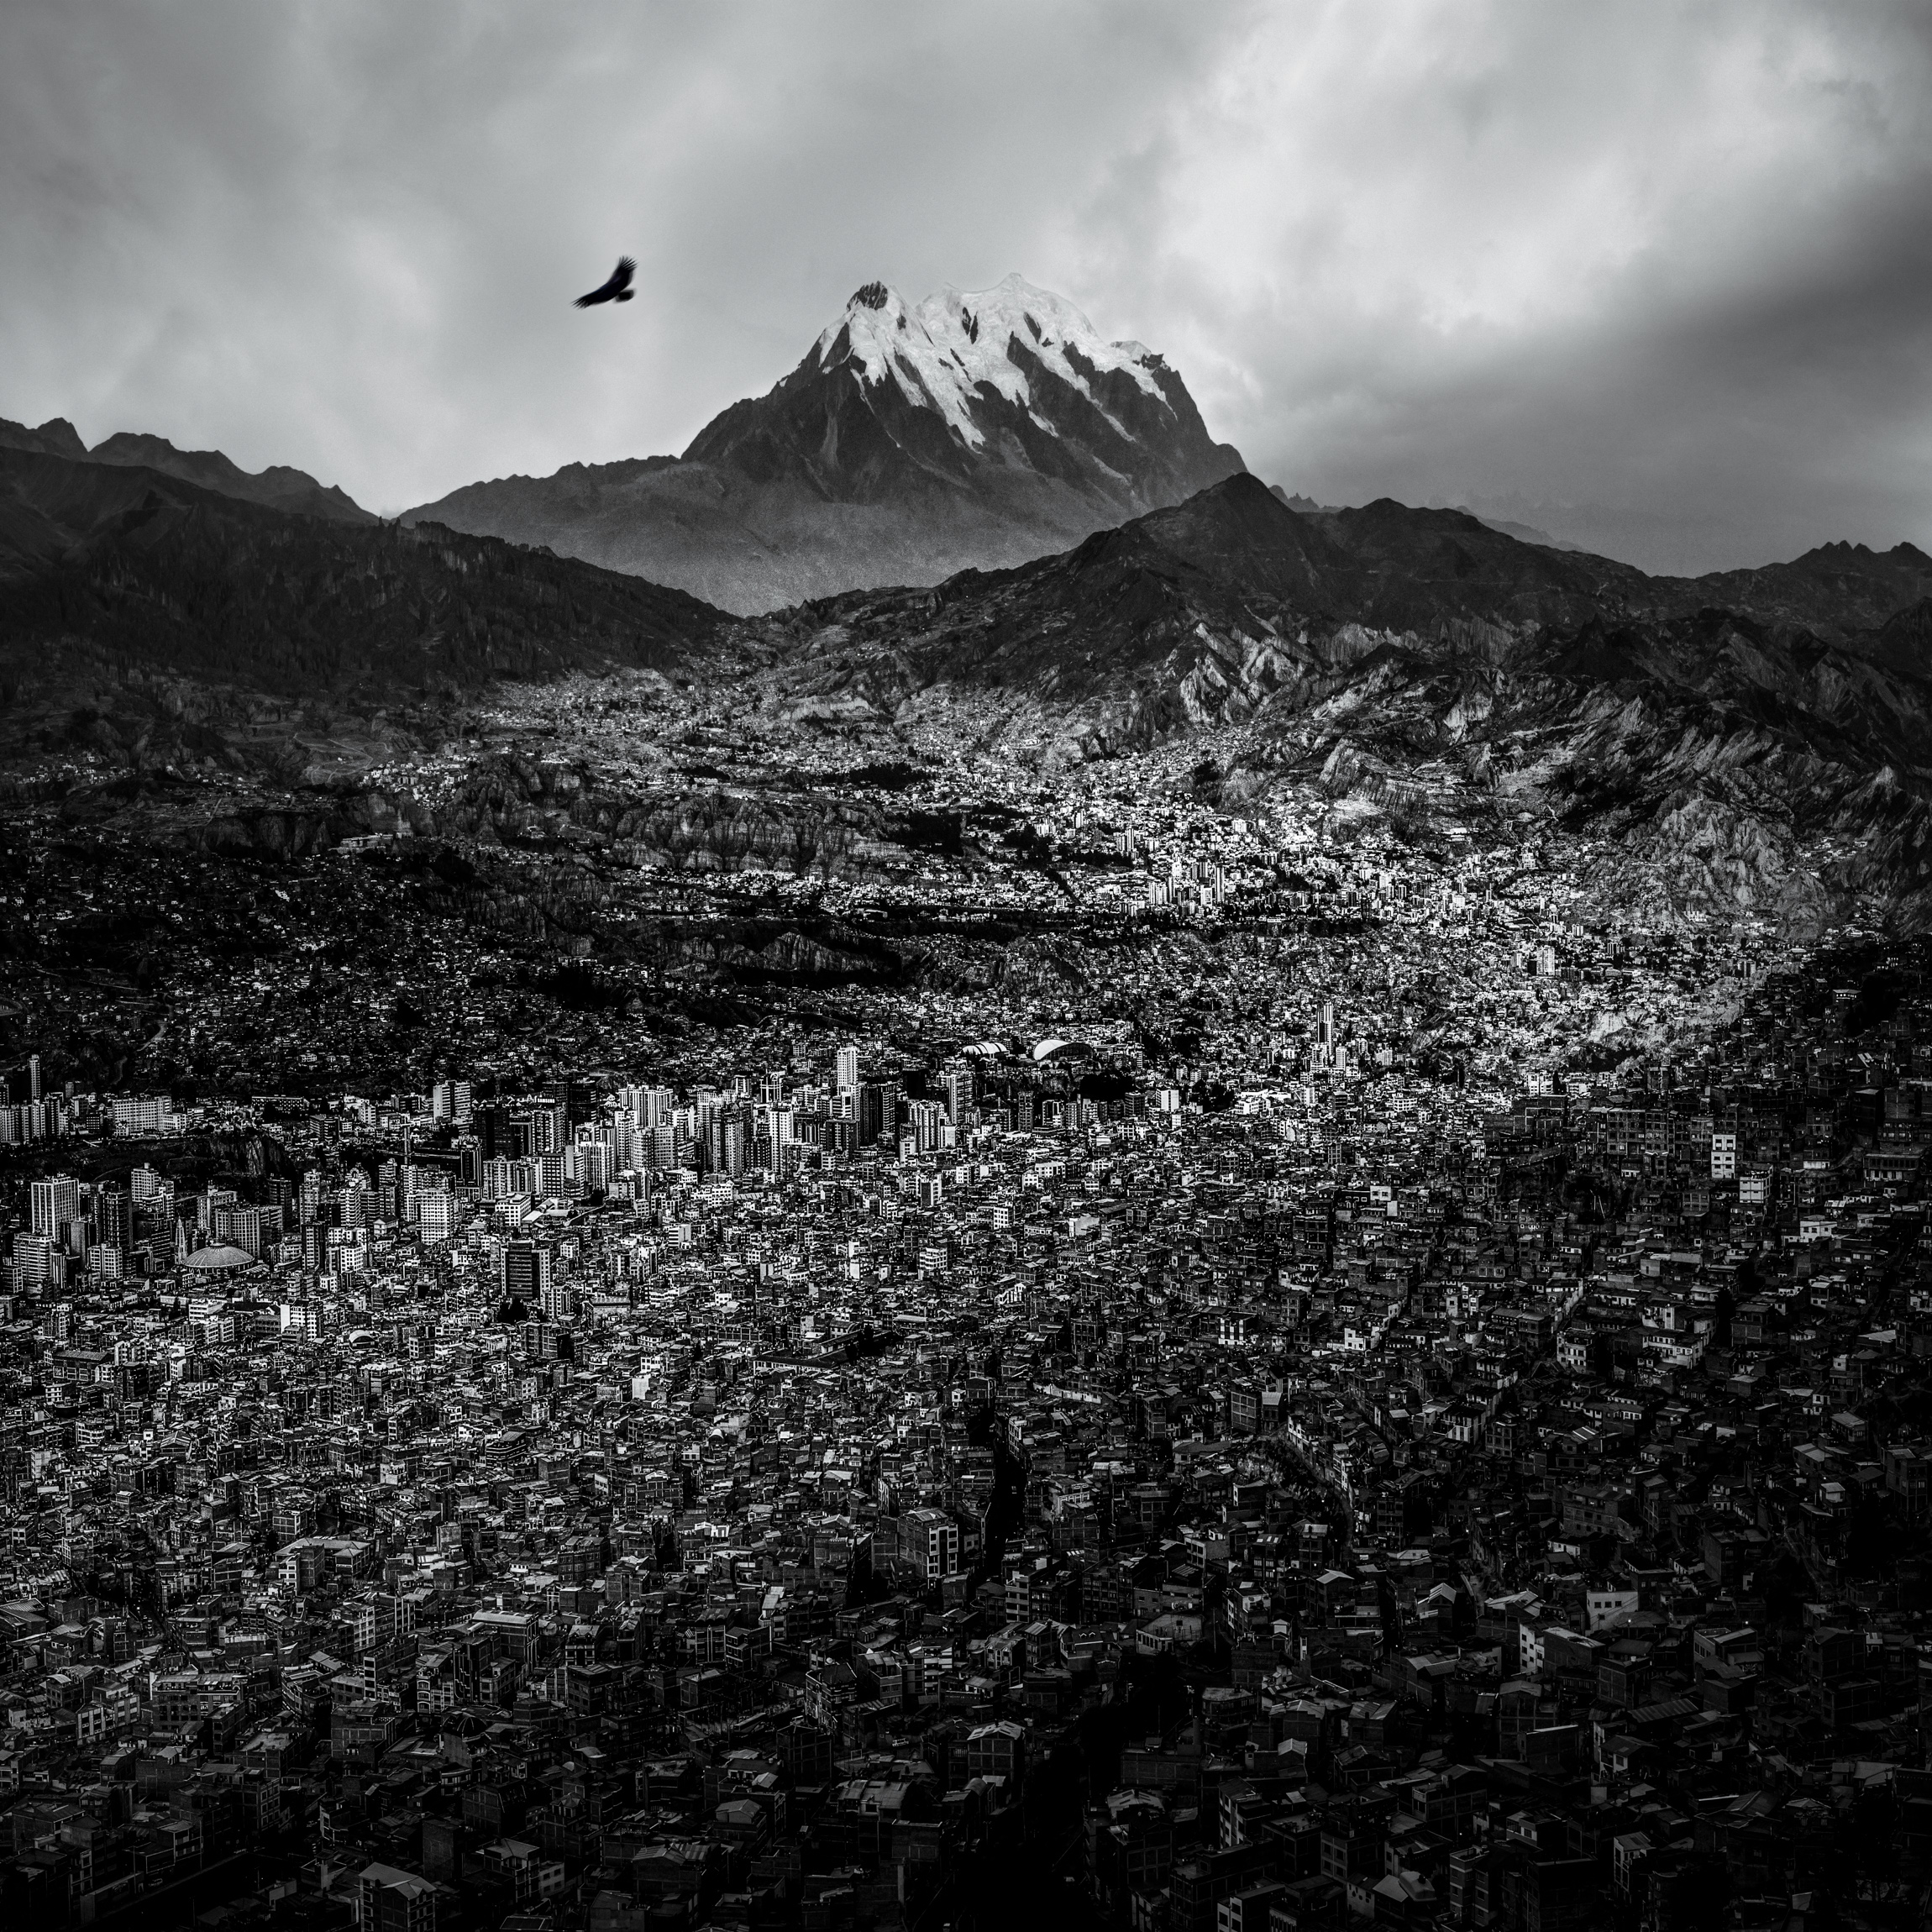 1st Place Landscape Category - La Paz and Illimani from El Alto